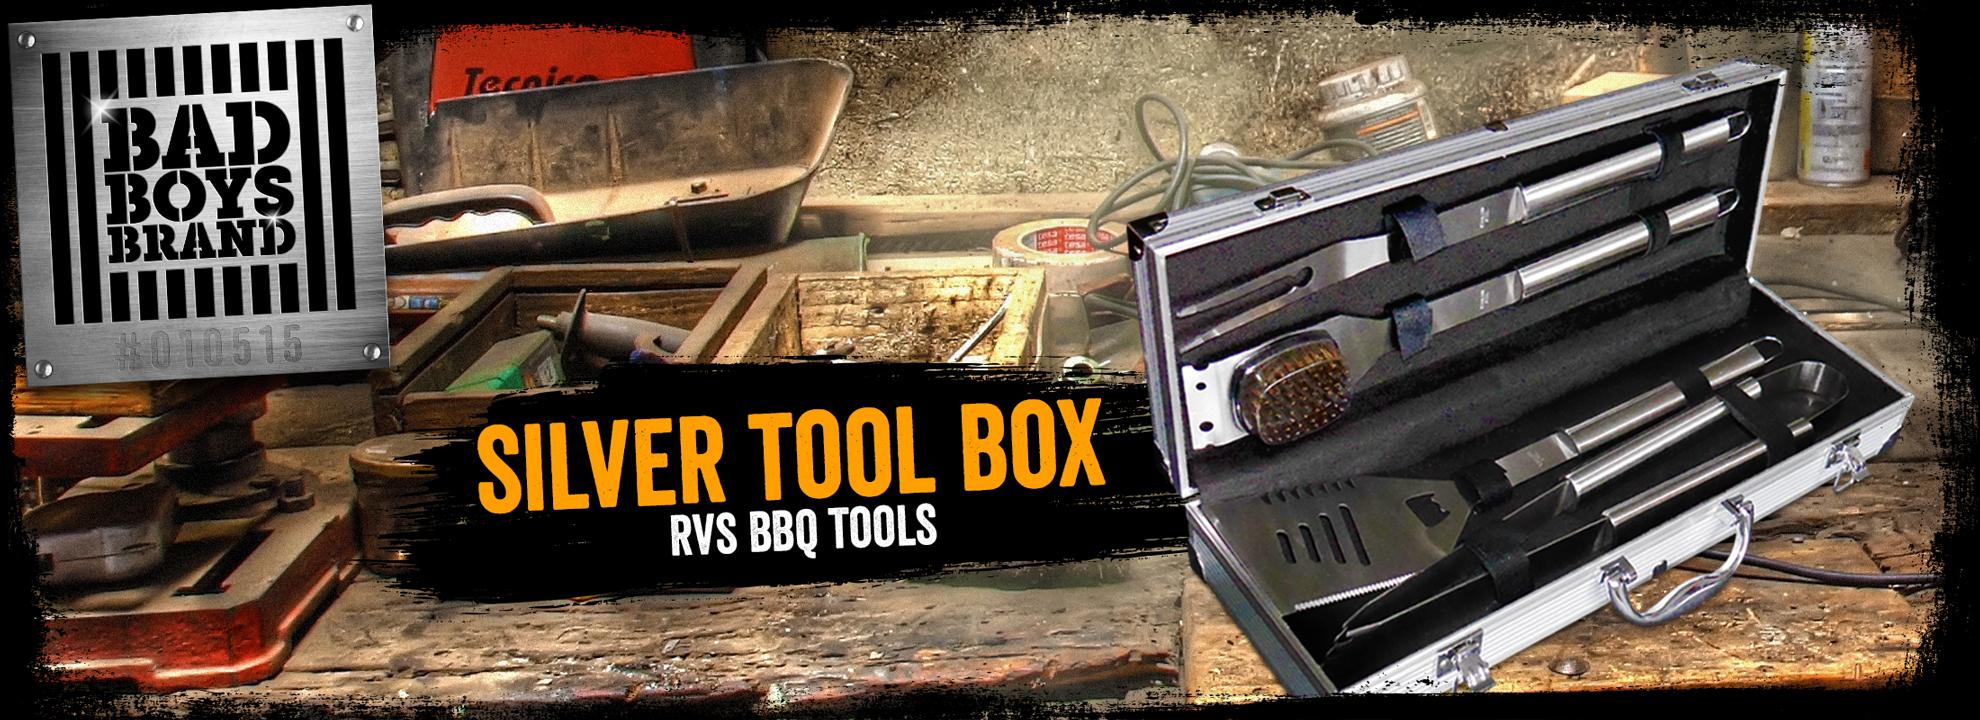 Silver Tool Box